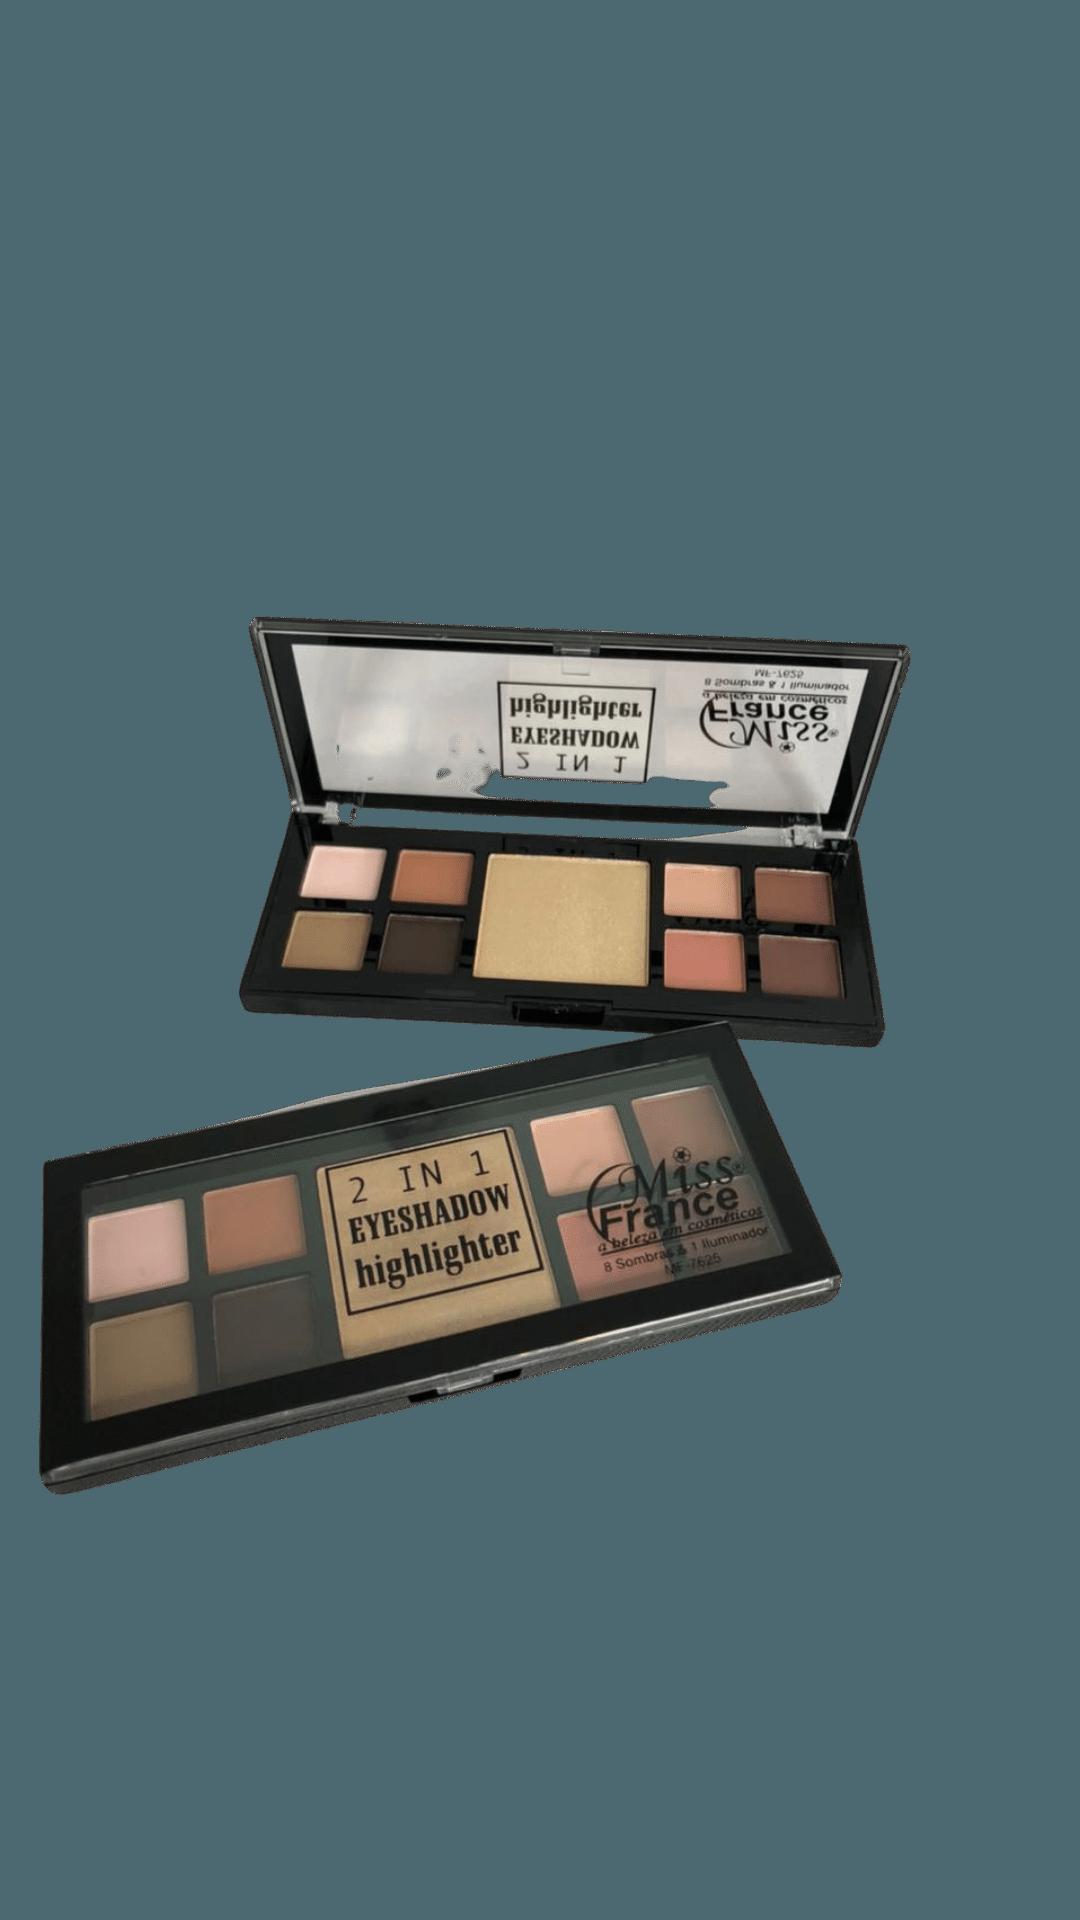 Paleta de Sombras 2 IN 1 Eyeshadow Highlighter C2 - Miss France (MF7625B)